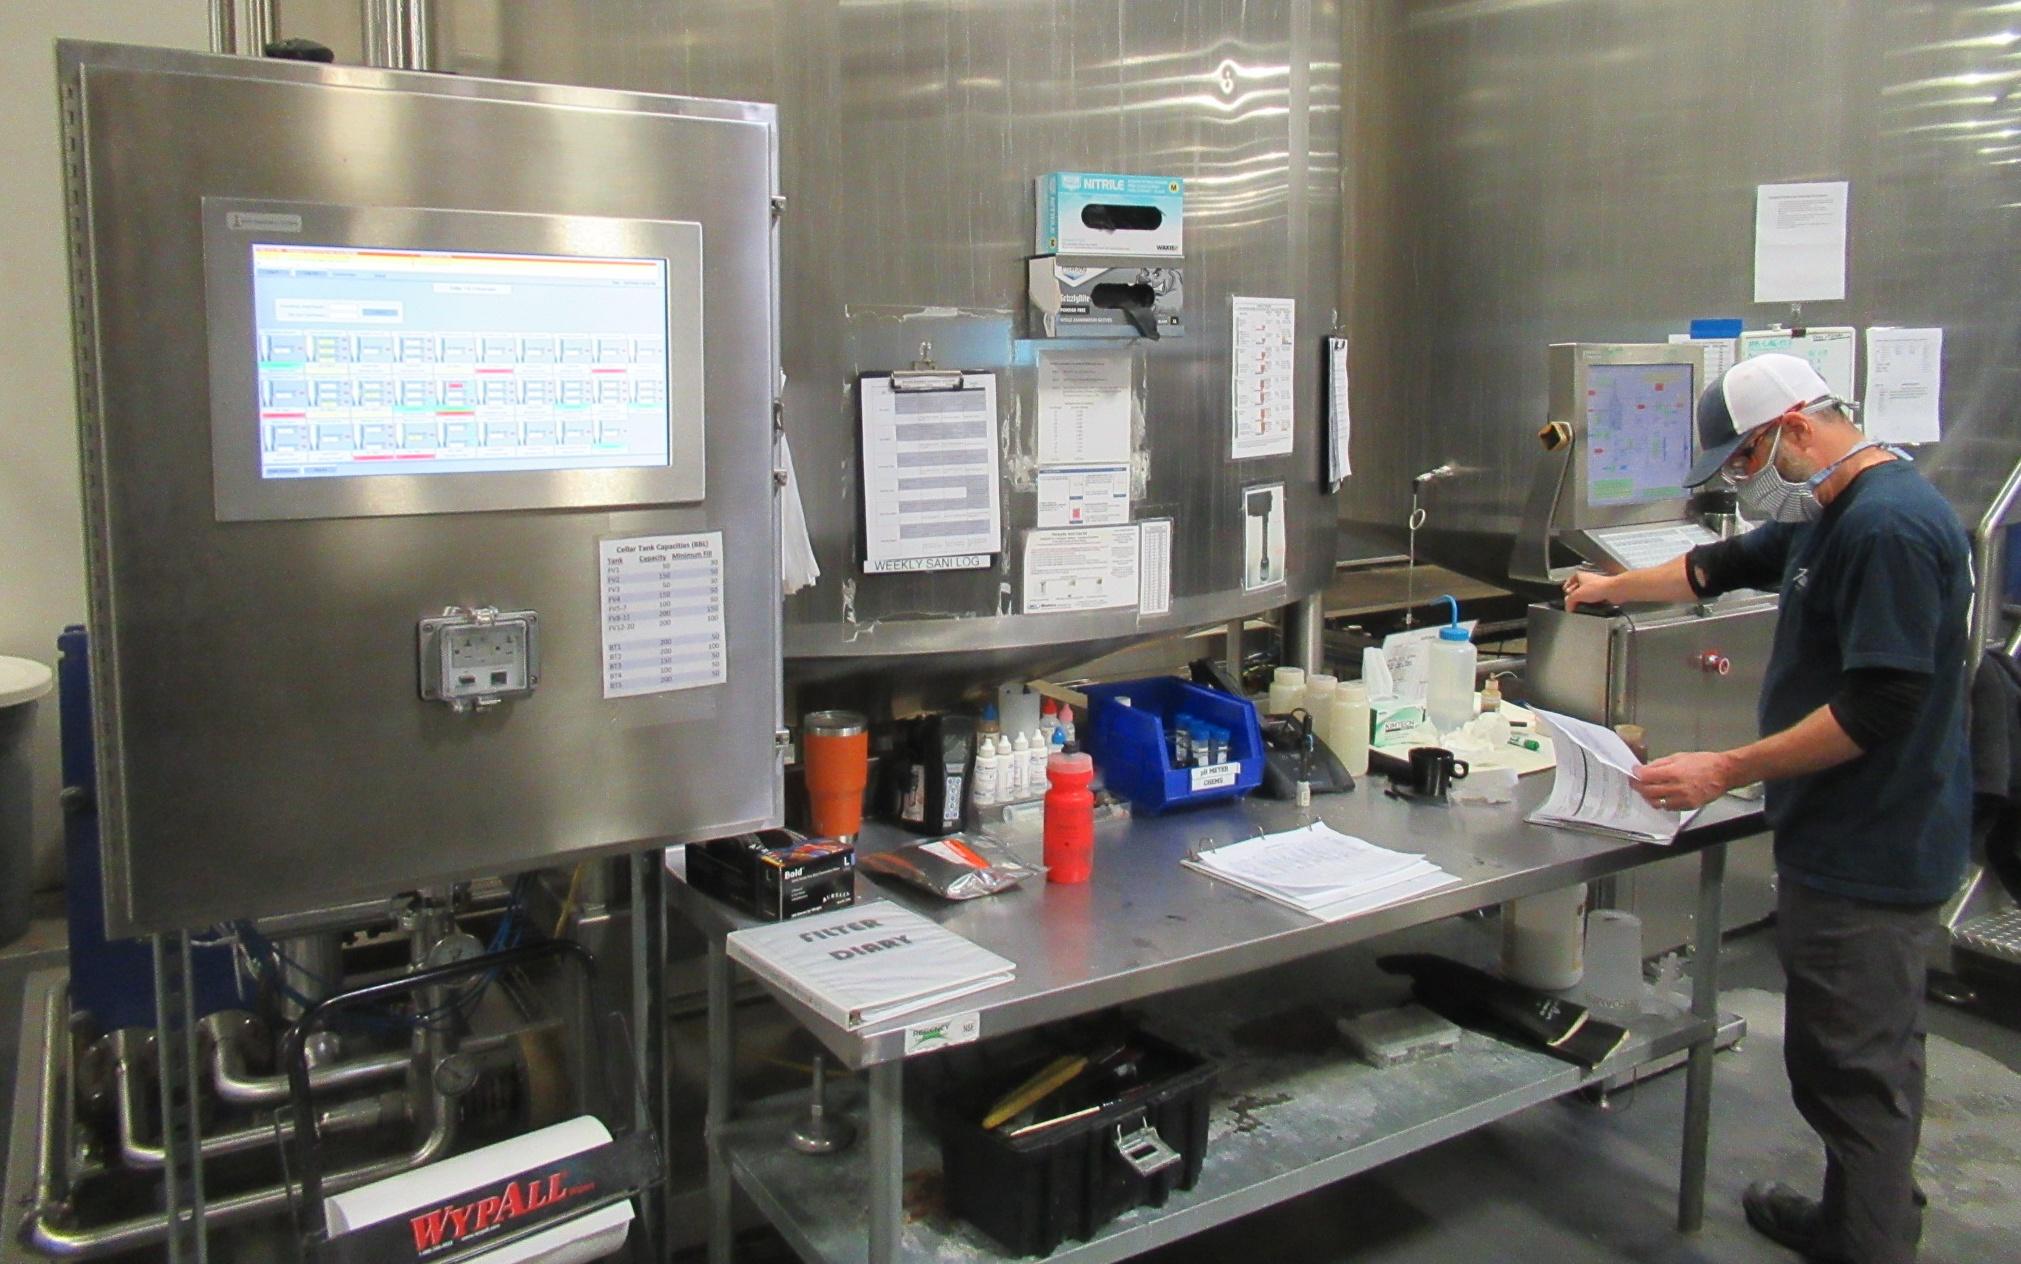 Sleeping Giant's Brewing Equipment